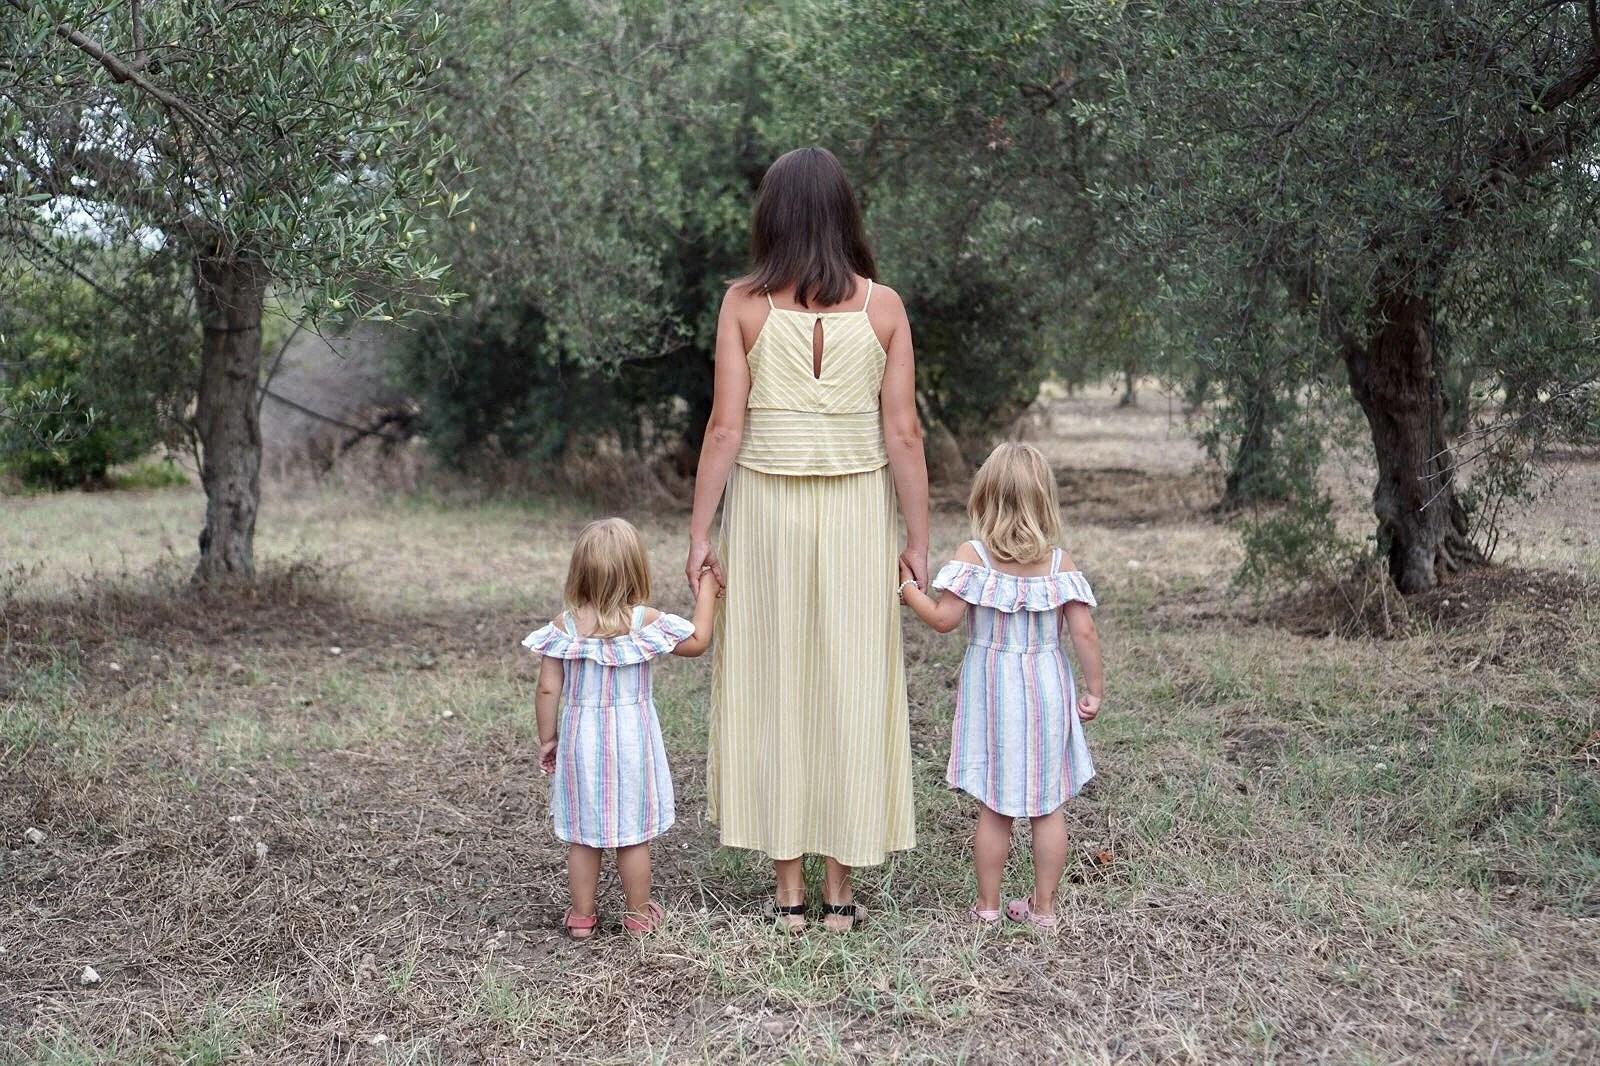 Bland olivträden